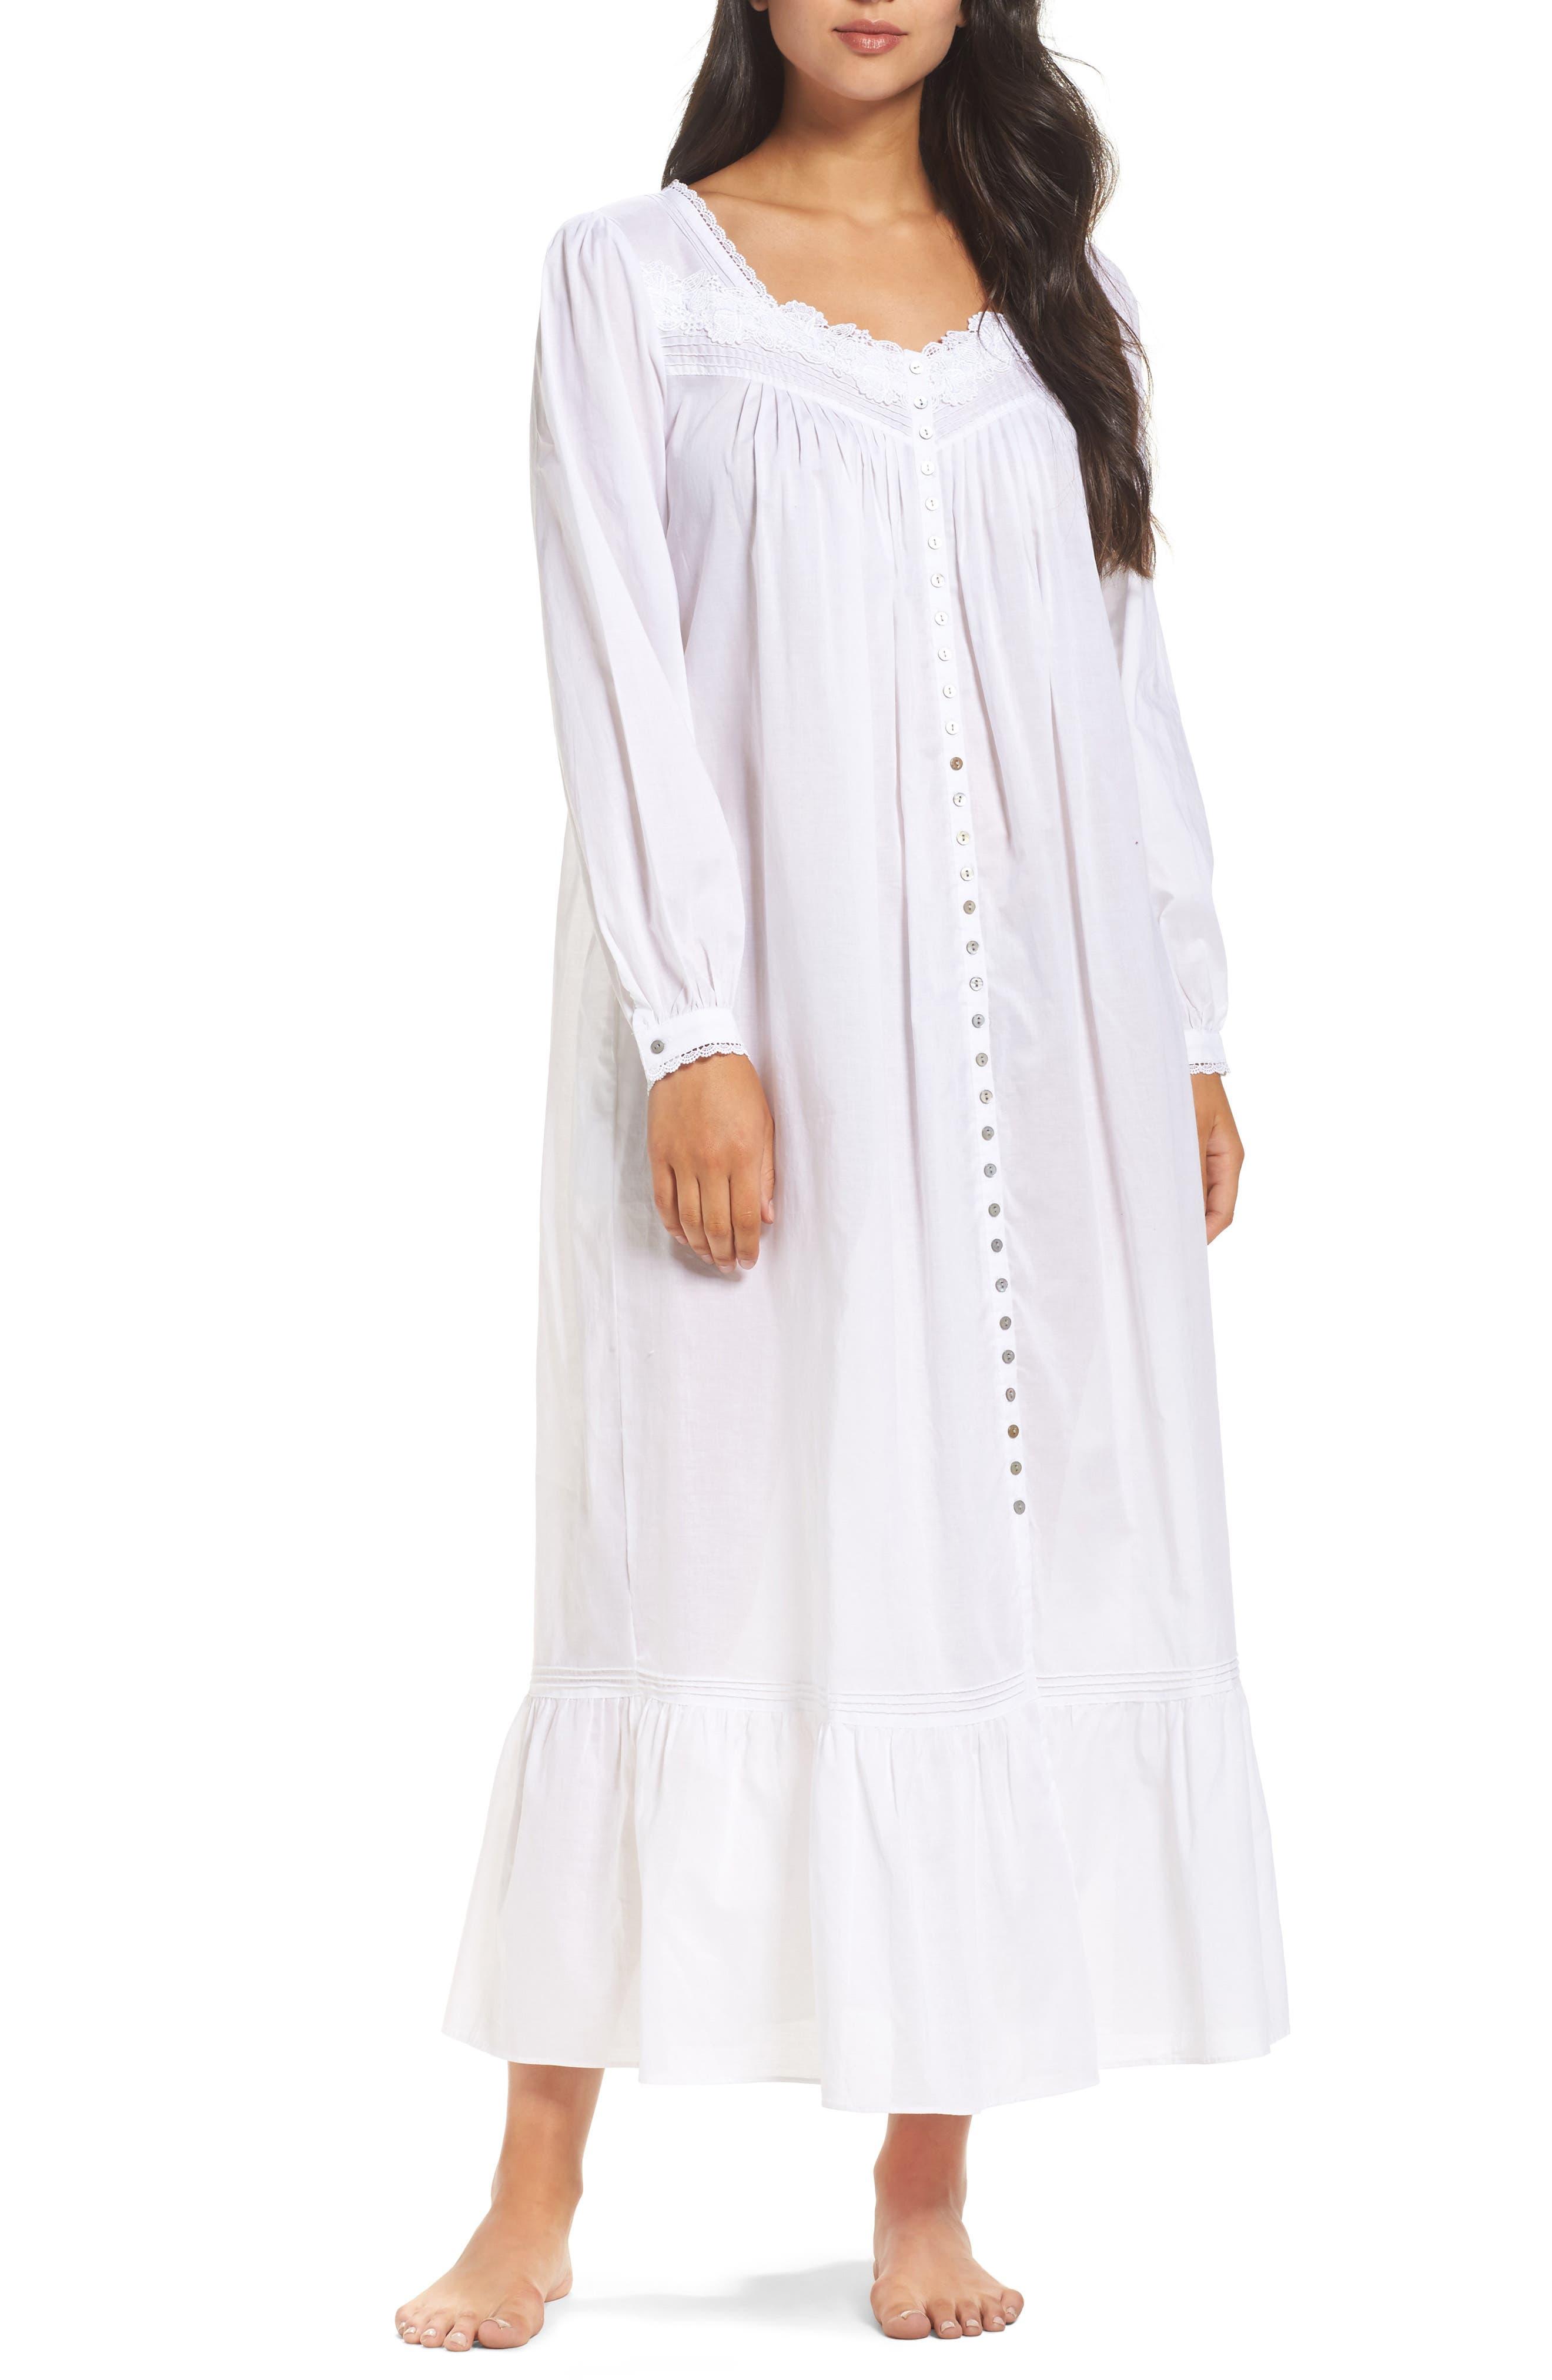 Ballet Button Nightgown,                         Main,                         color, 100